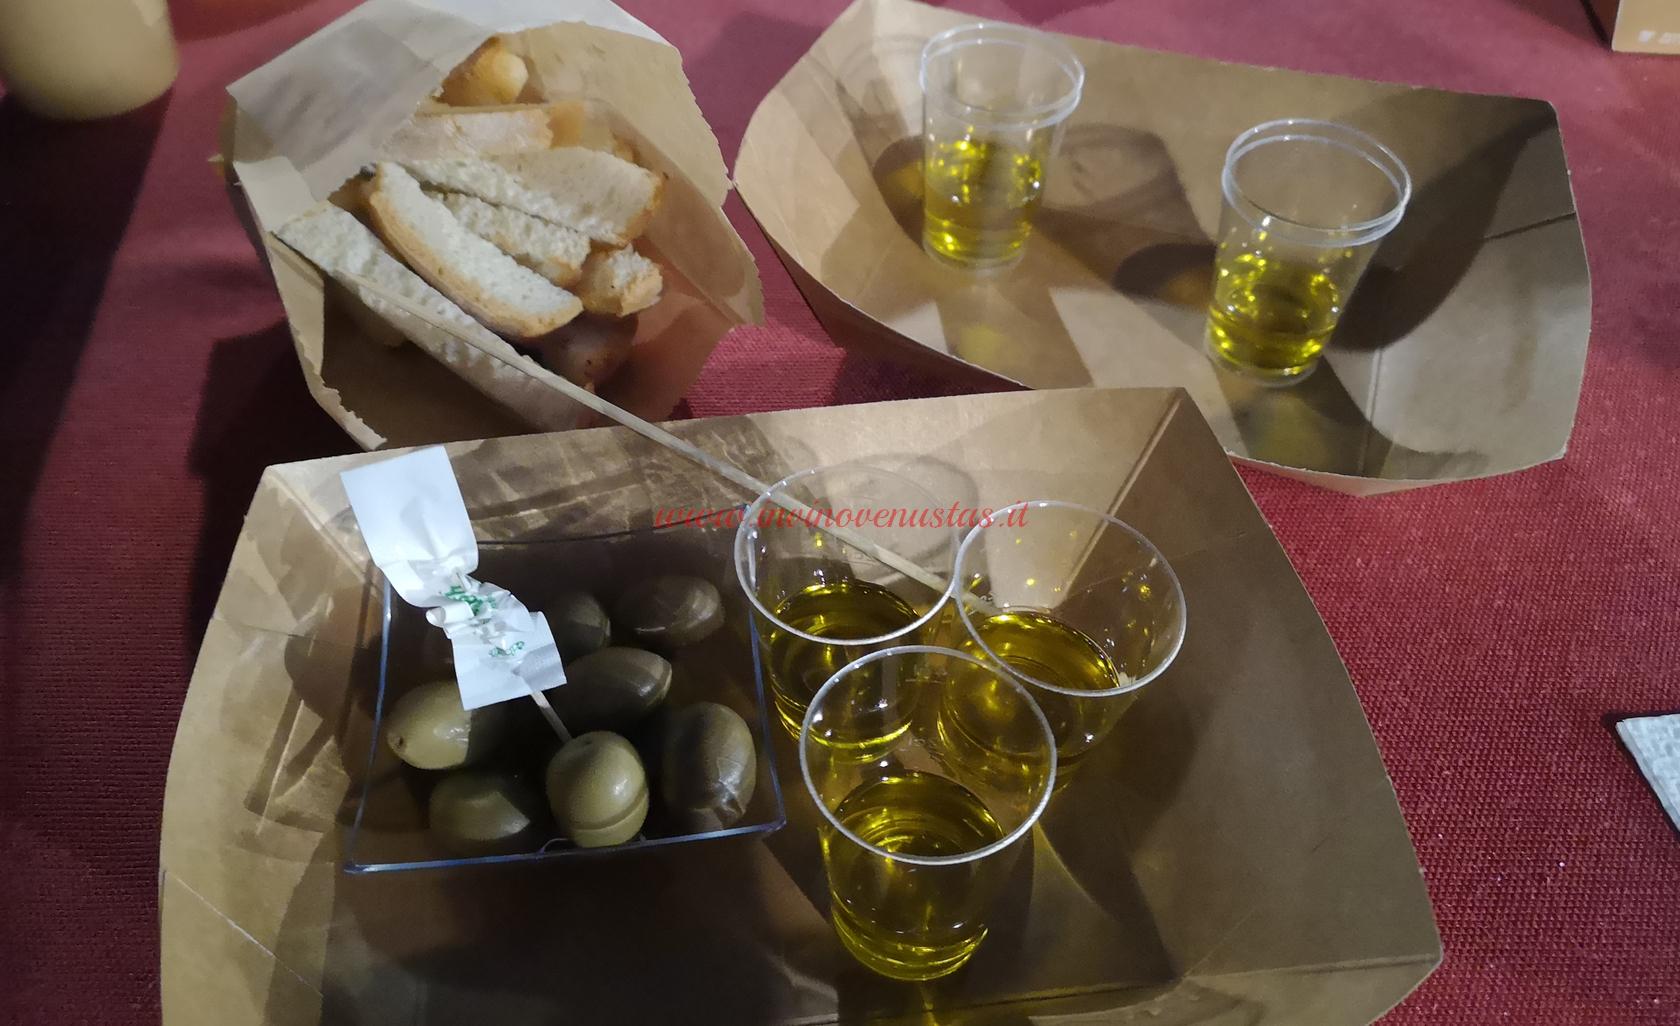 Pane olio e olive Conventino Monteciccardo